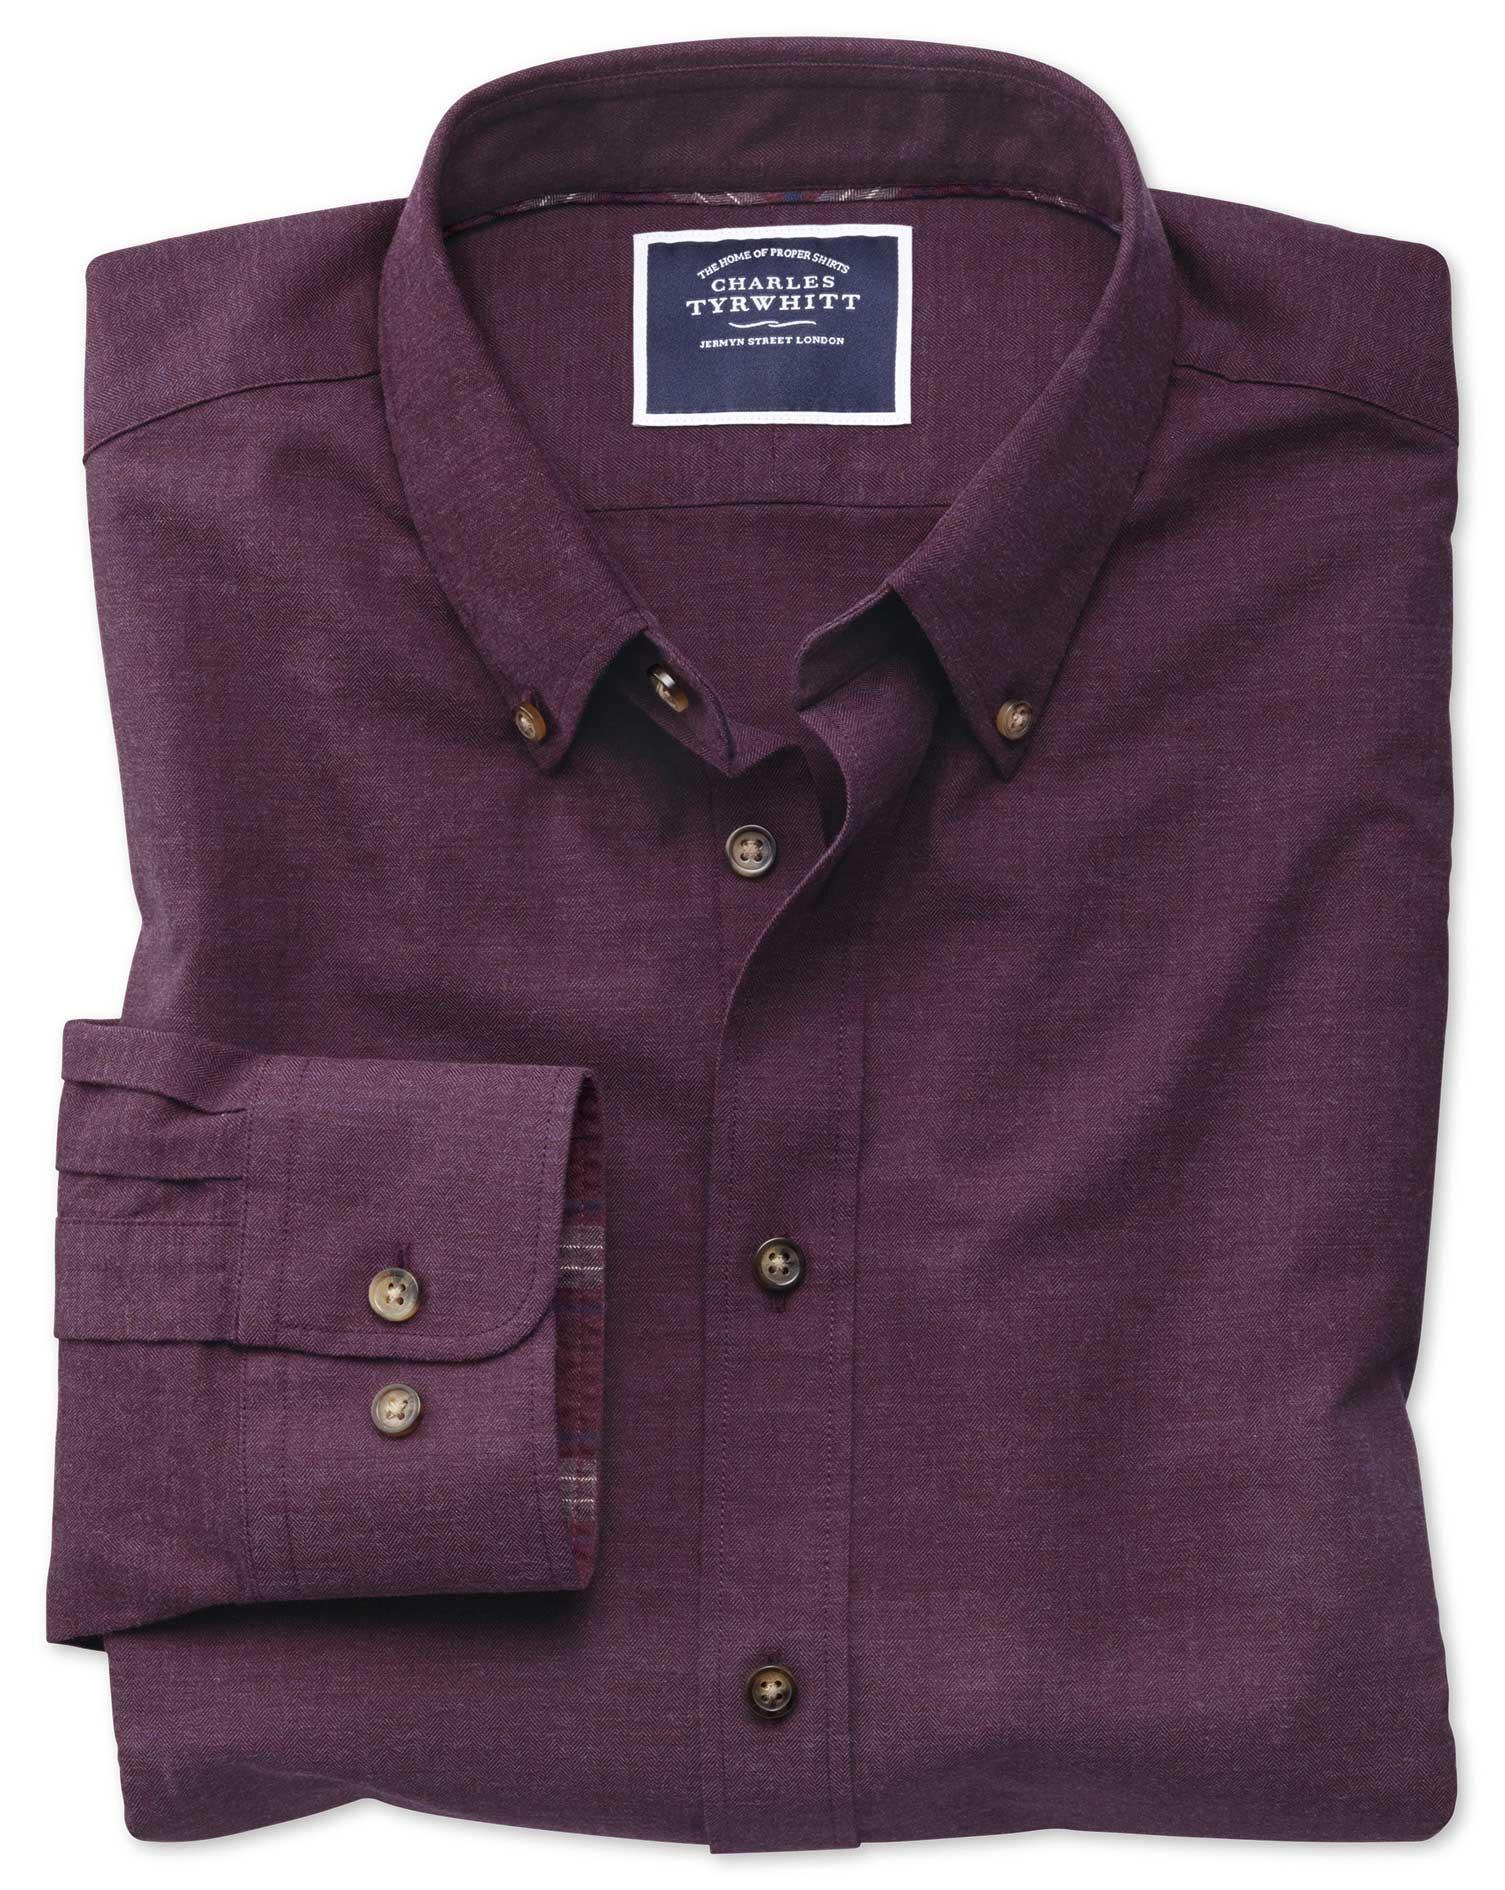 Classic Fit Berry Herringbone Melange Cotton Shirt Single Cuff Size Medium by Charles Tyrwhitt